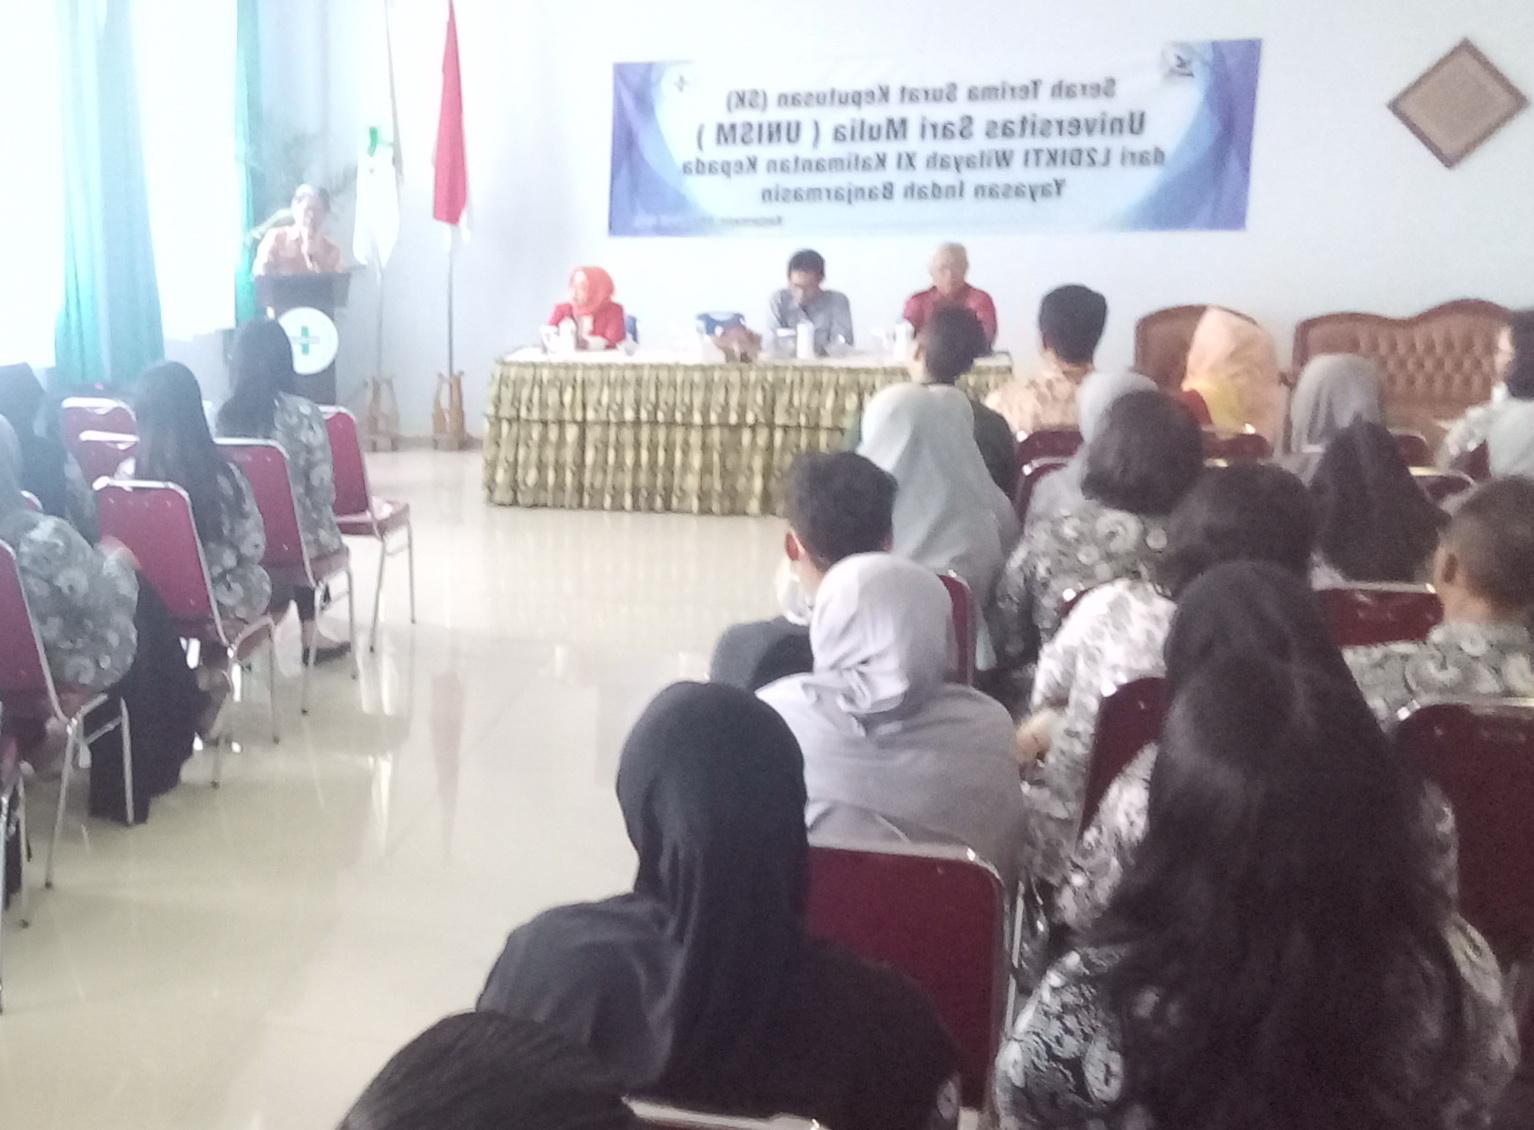 Sambutan Kepala LLDIKTI XI-Prof. Dr. Ir. H. Udiansyah, M.S